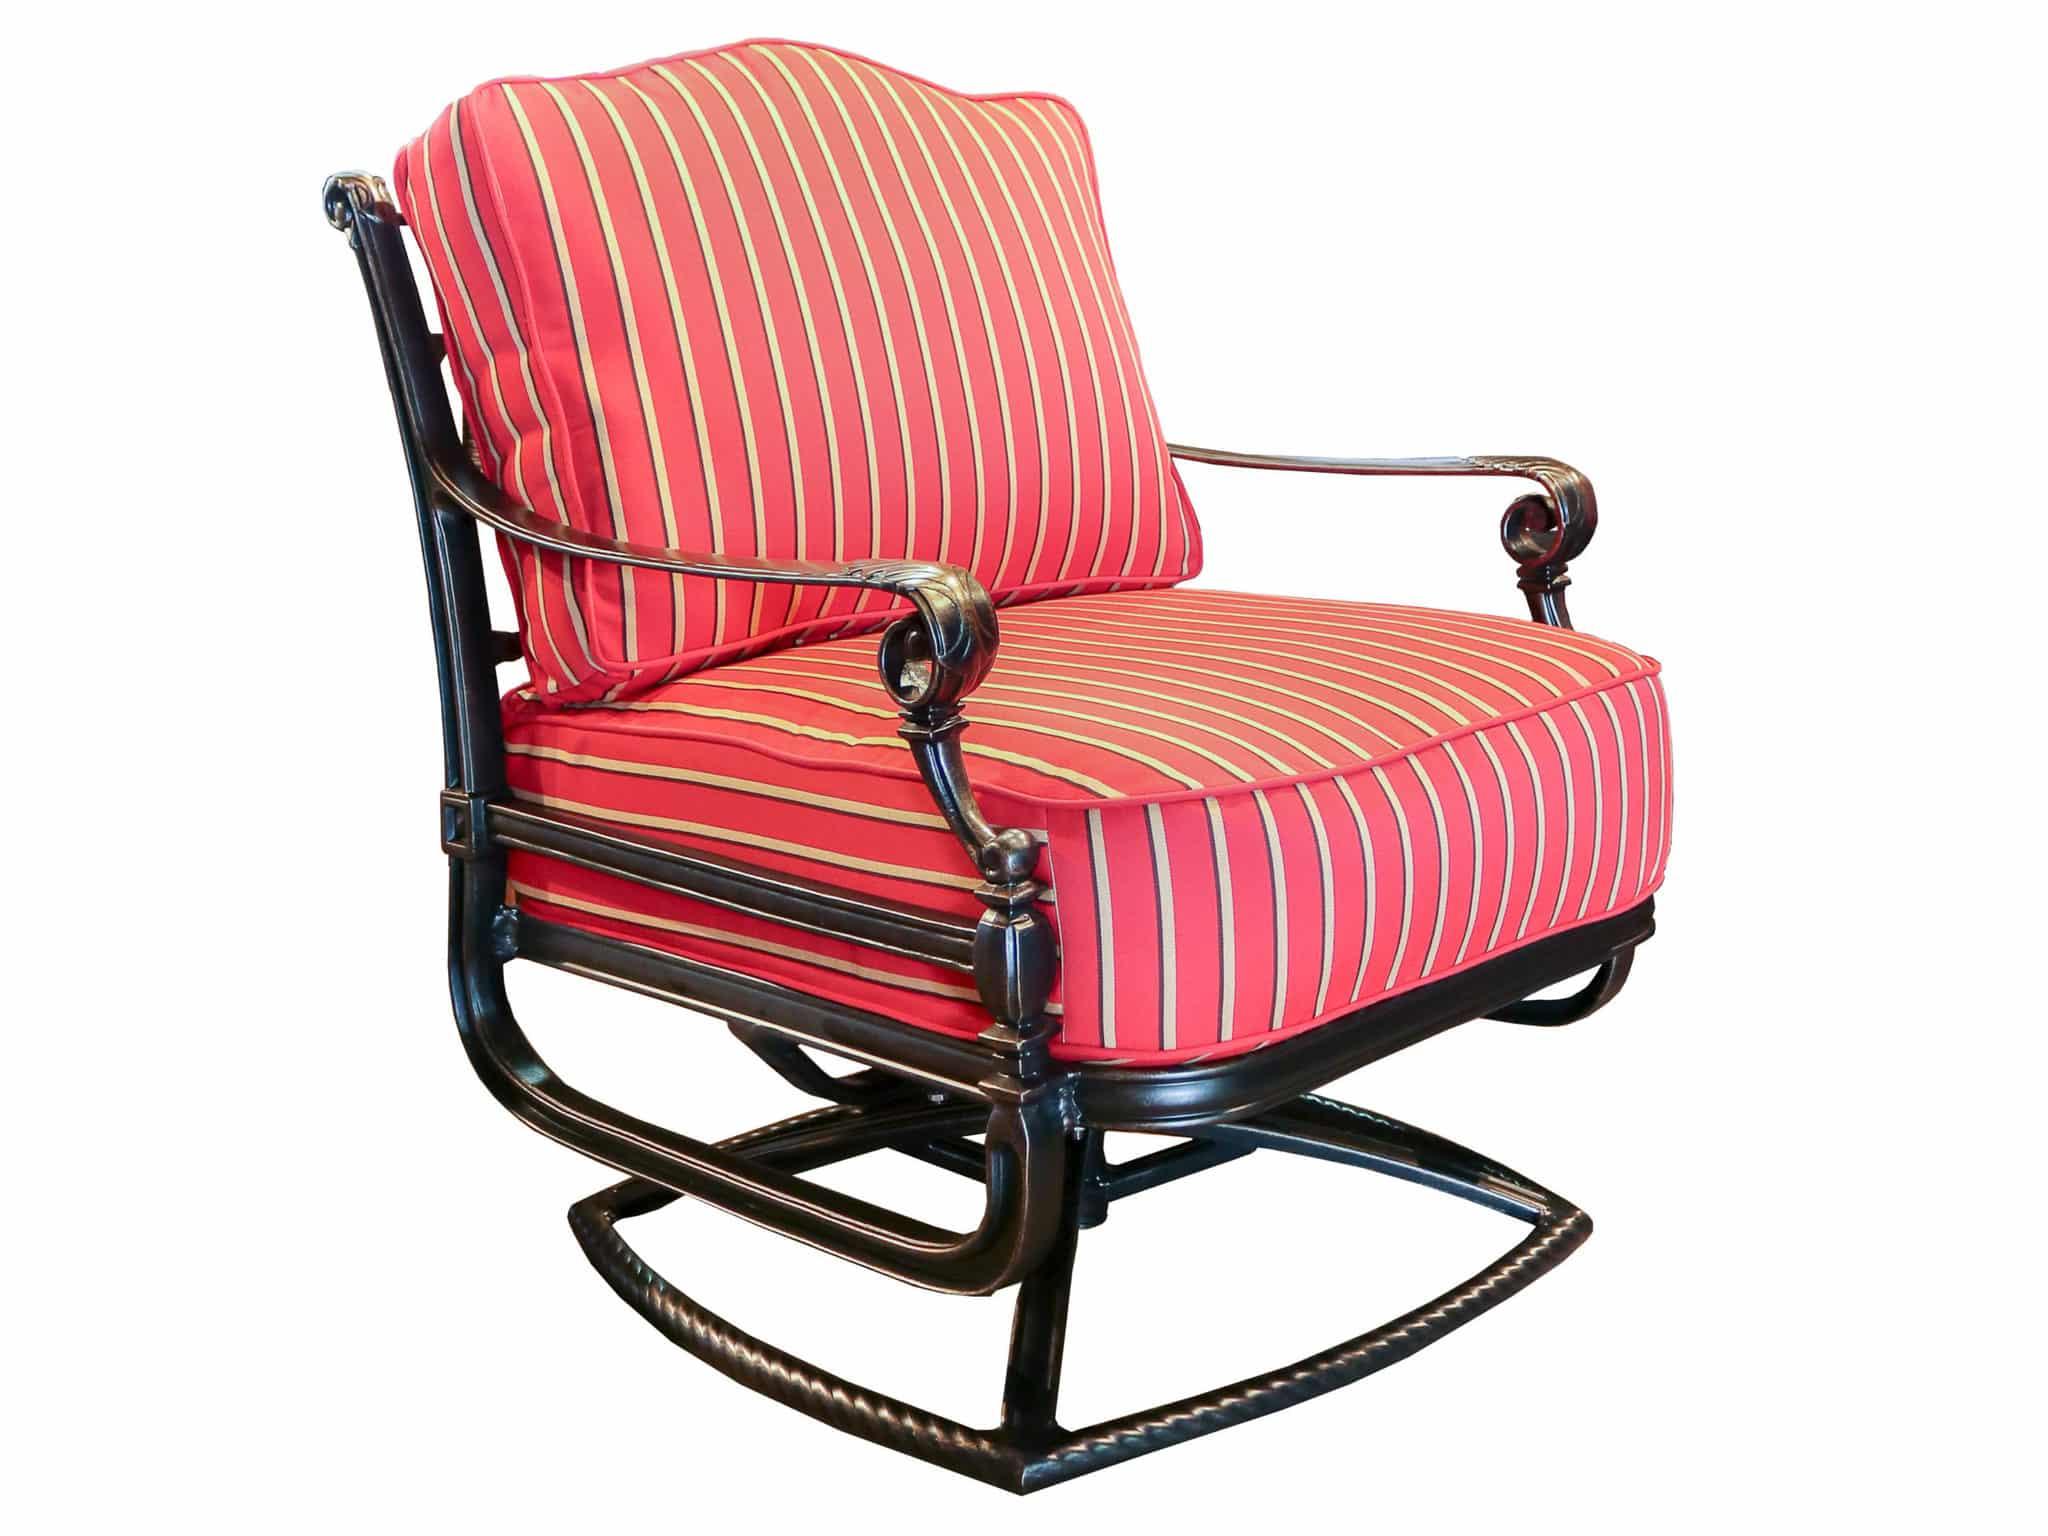 Gensun Grand Terrance Cushions by Hauser's Patio